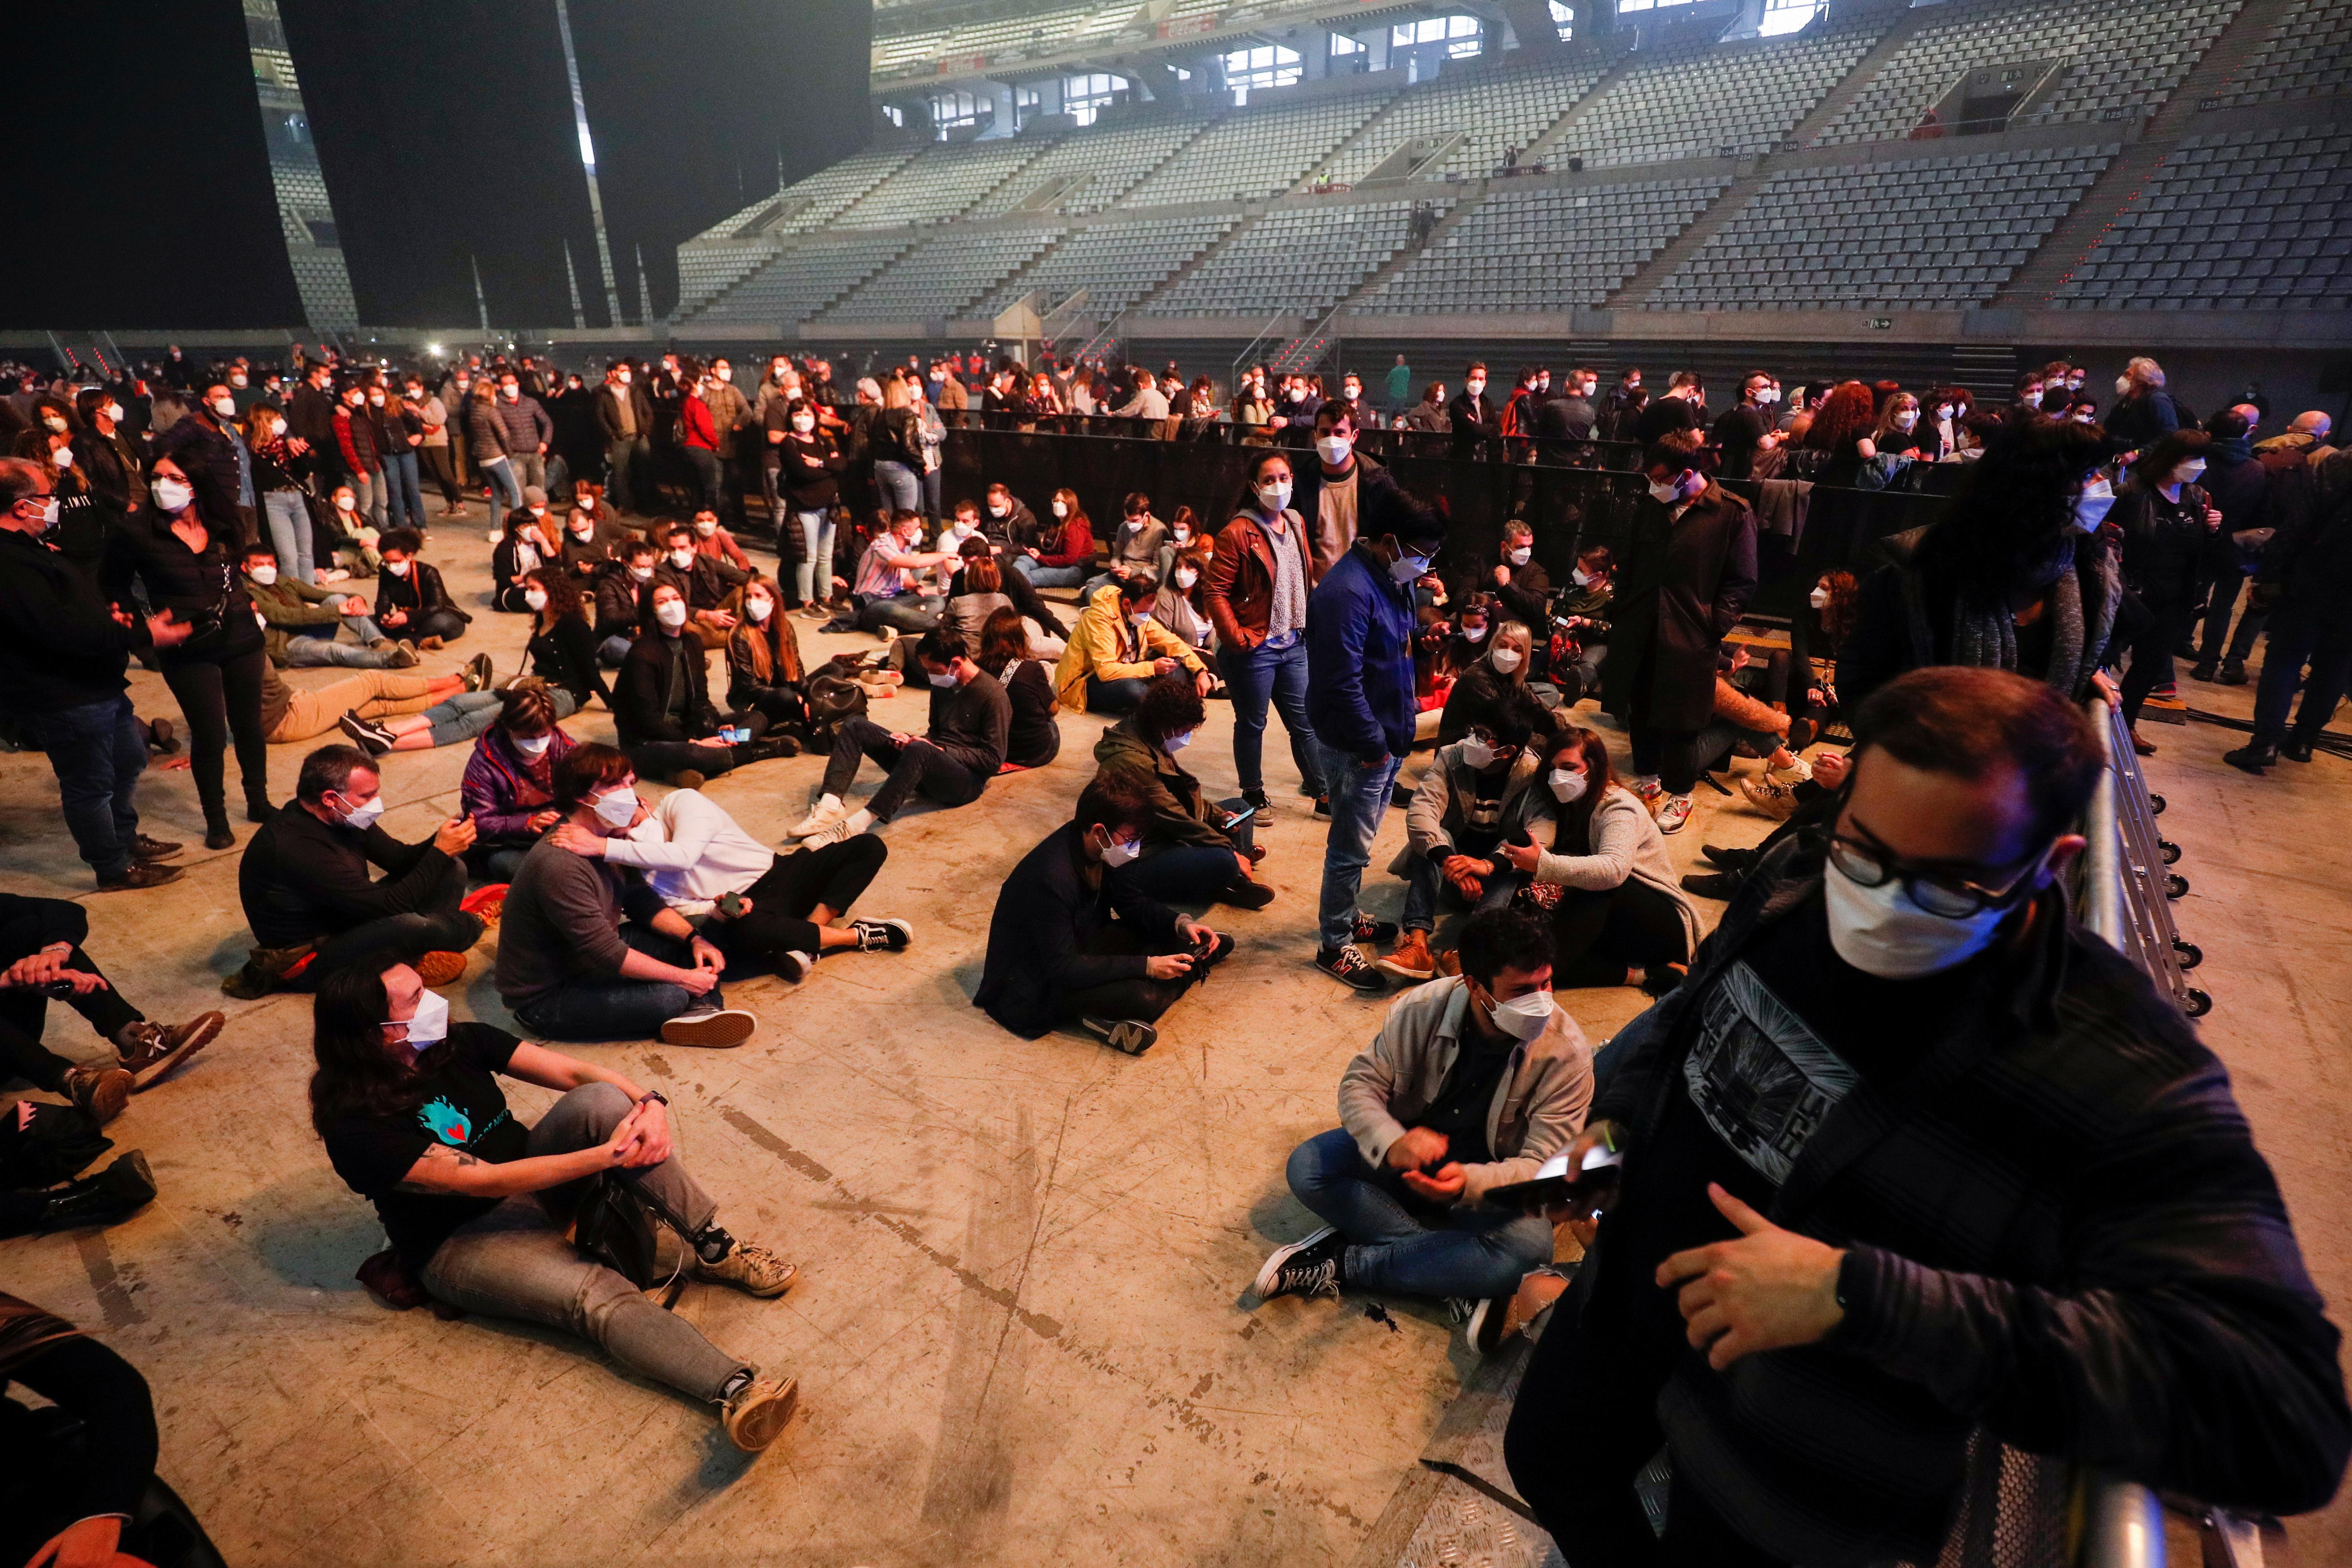 Spectators wearing face masks wait before a concert of